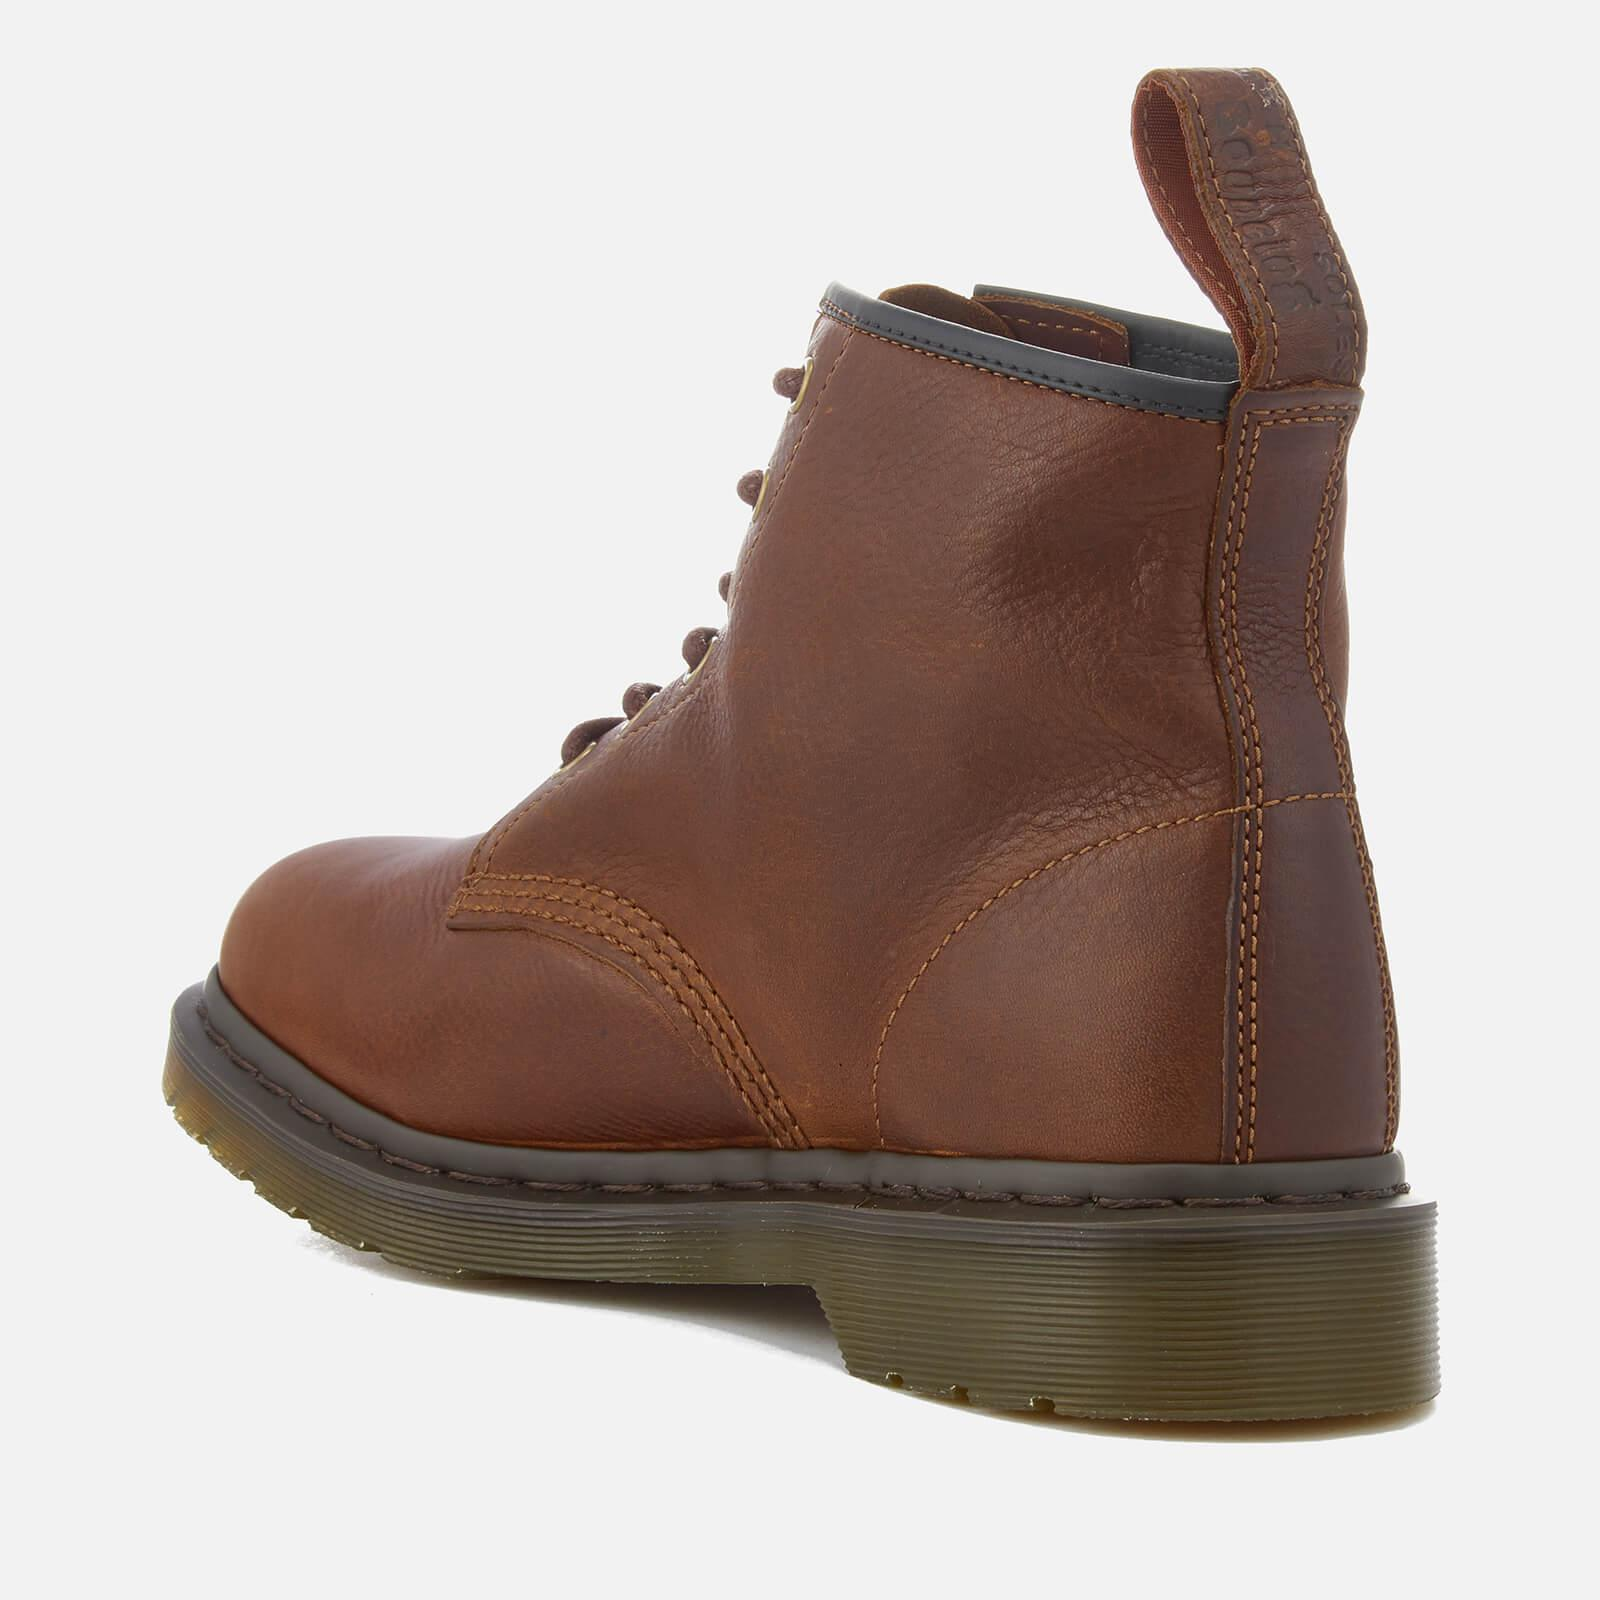 Dr. Martens Men's 101 Harvest Leather 6-Eye Lace Up Boots - - UK 8 vsZOmvZd